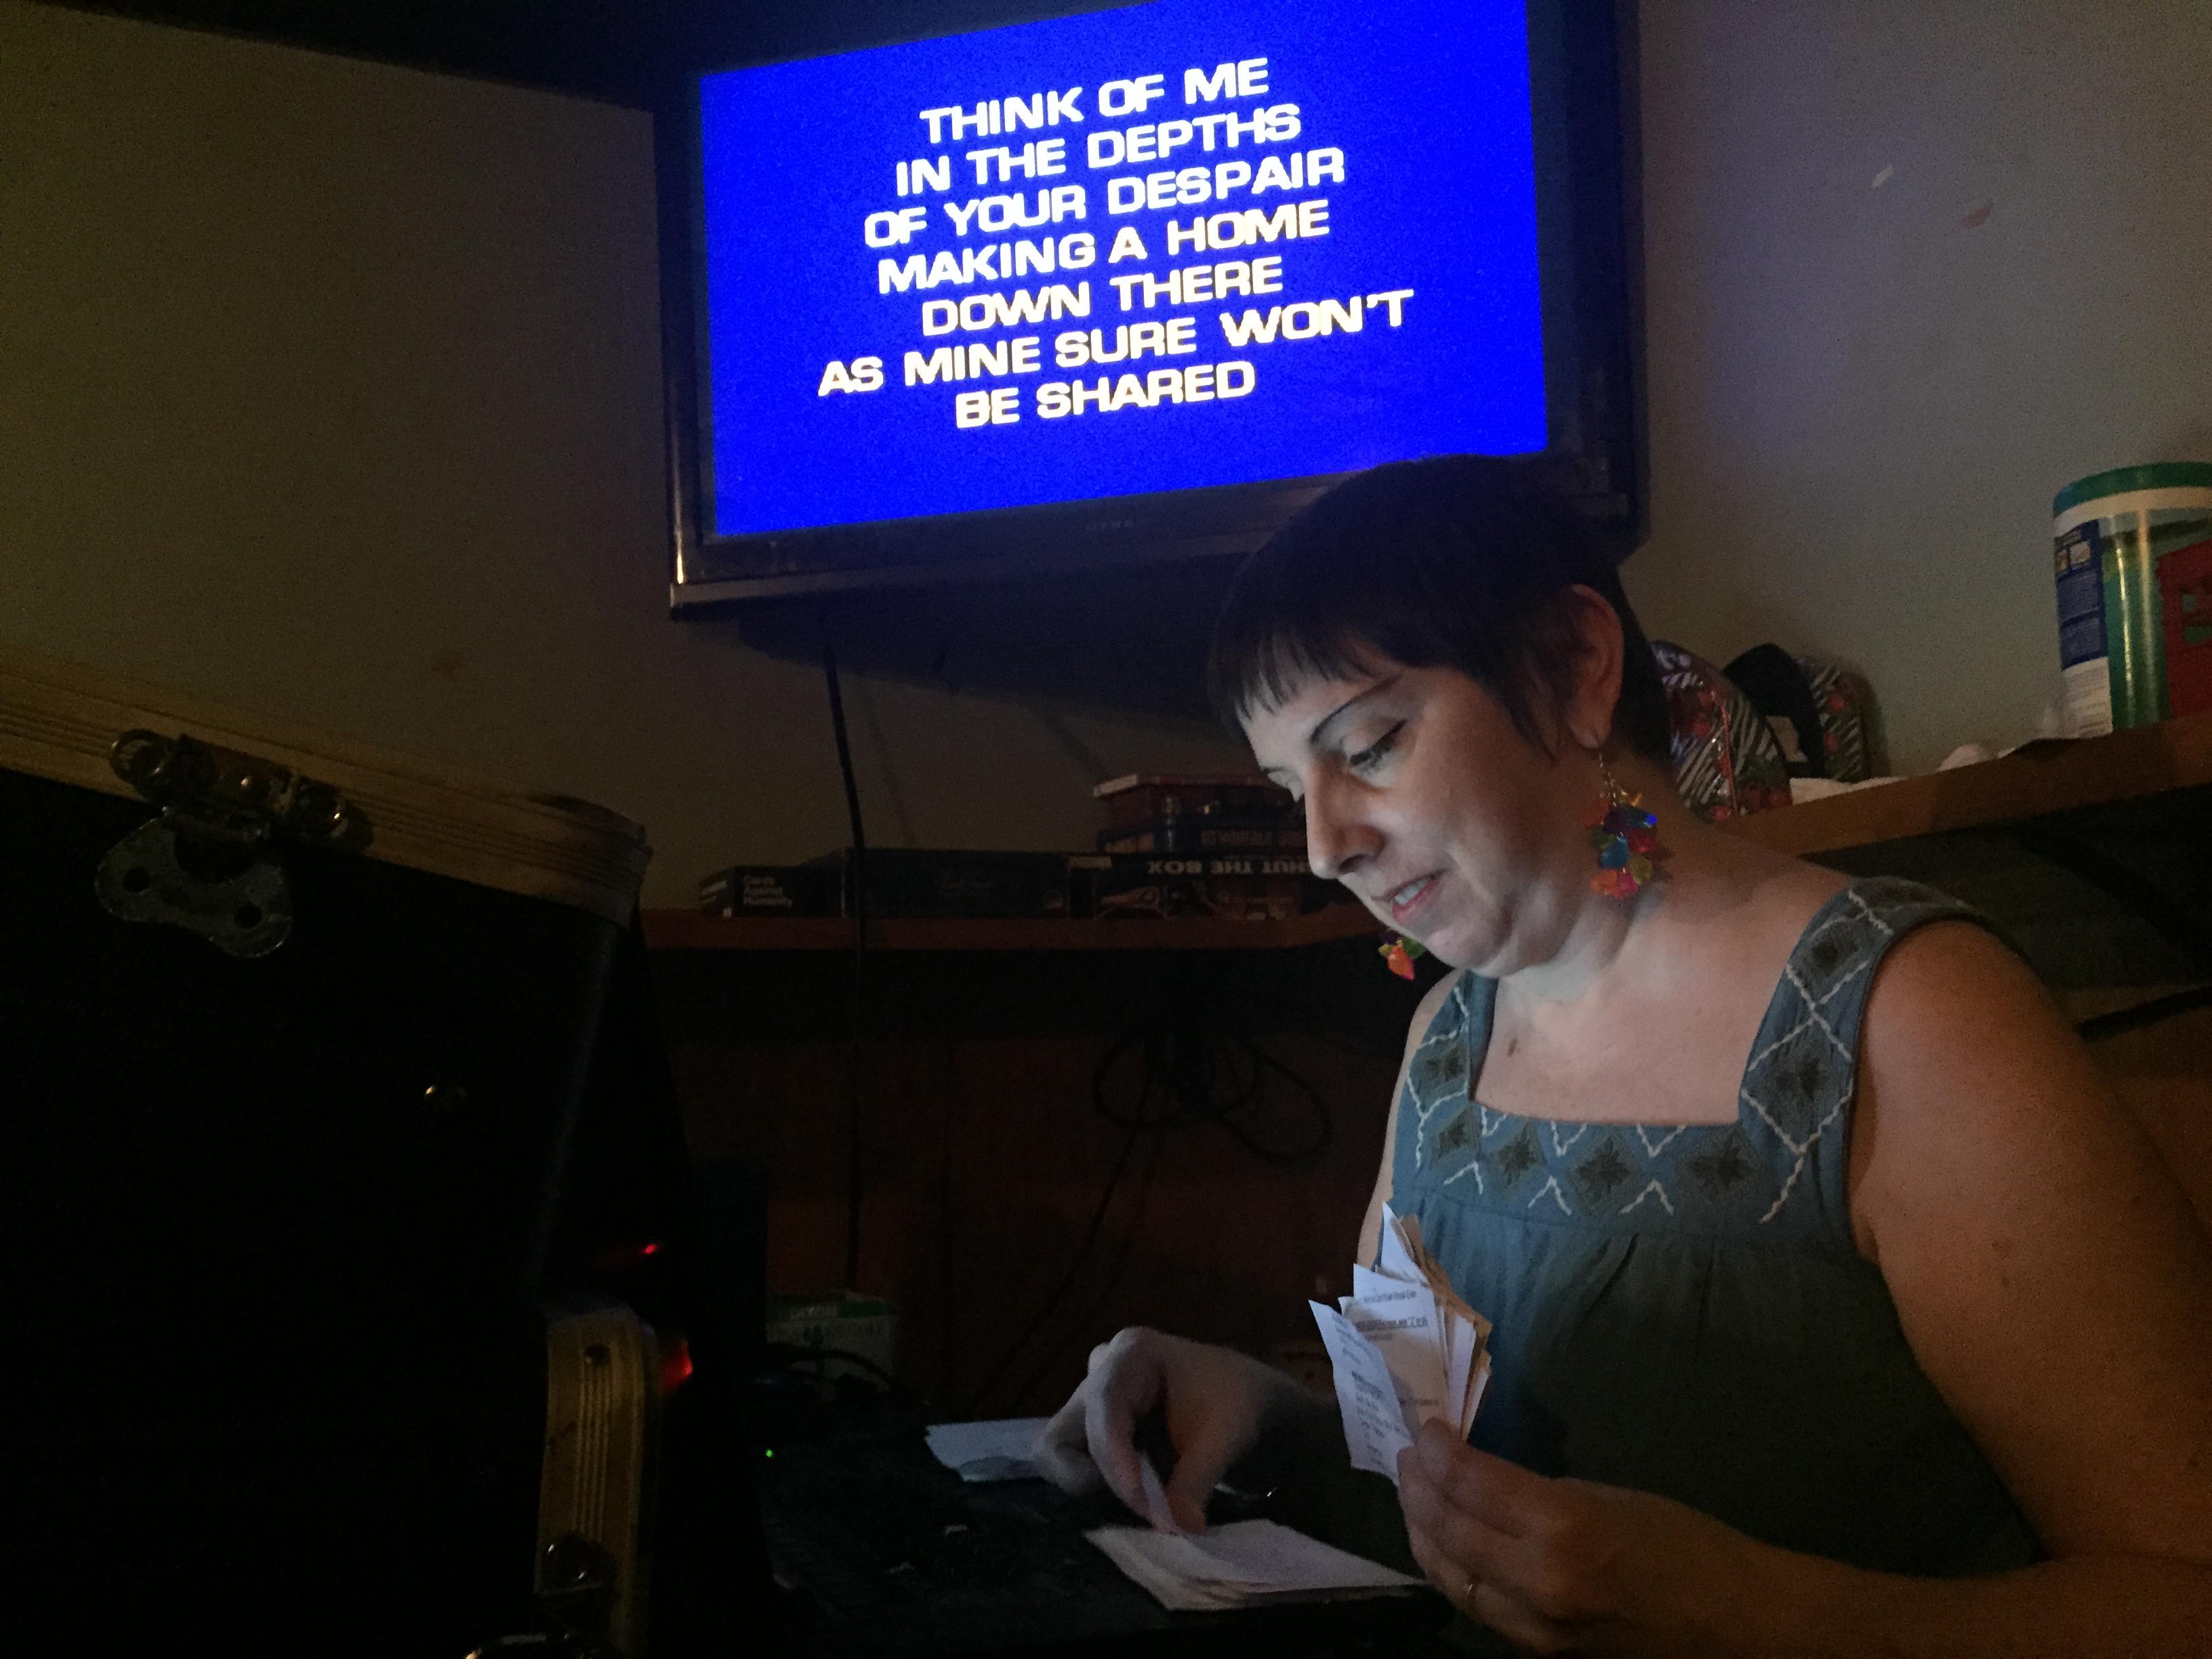 Sara Sherr hosts karaoke at bars around Philadelphia.